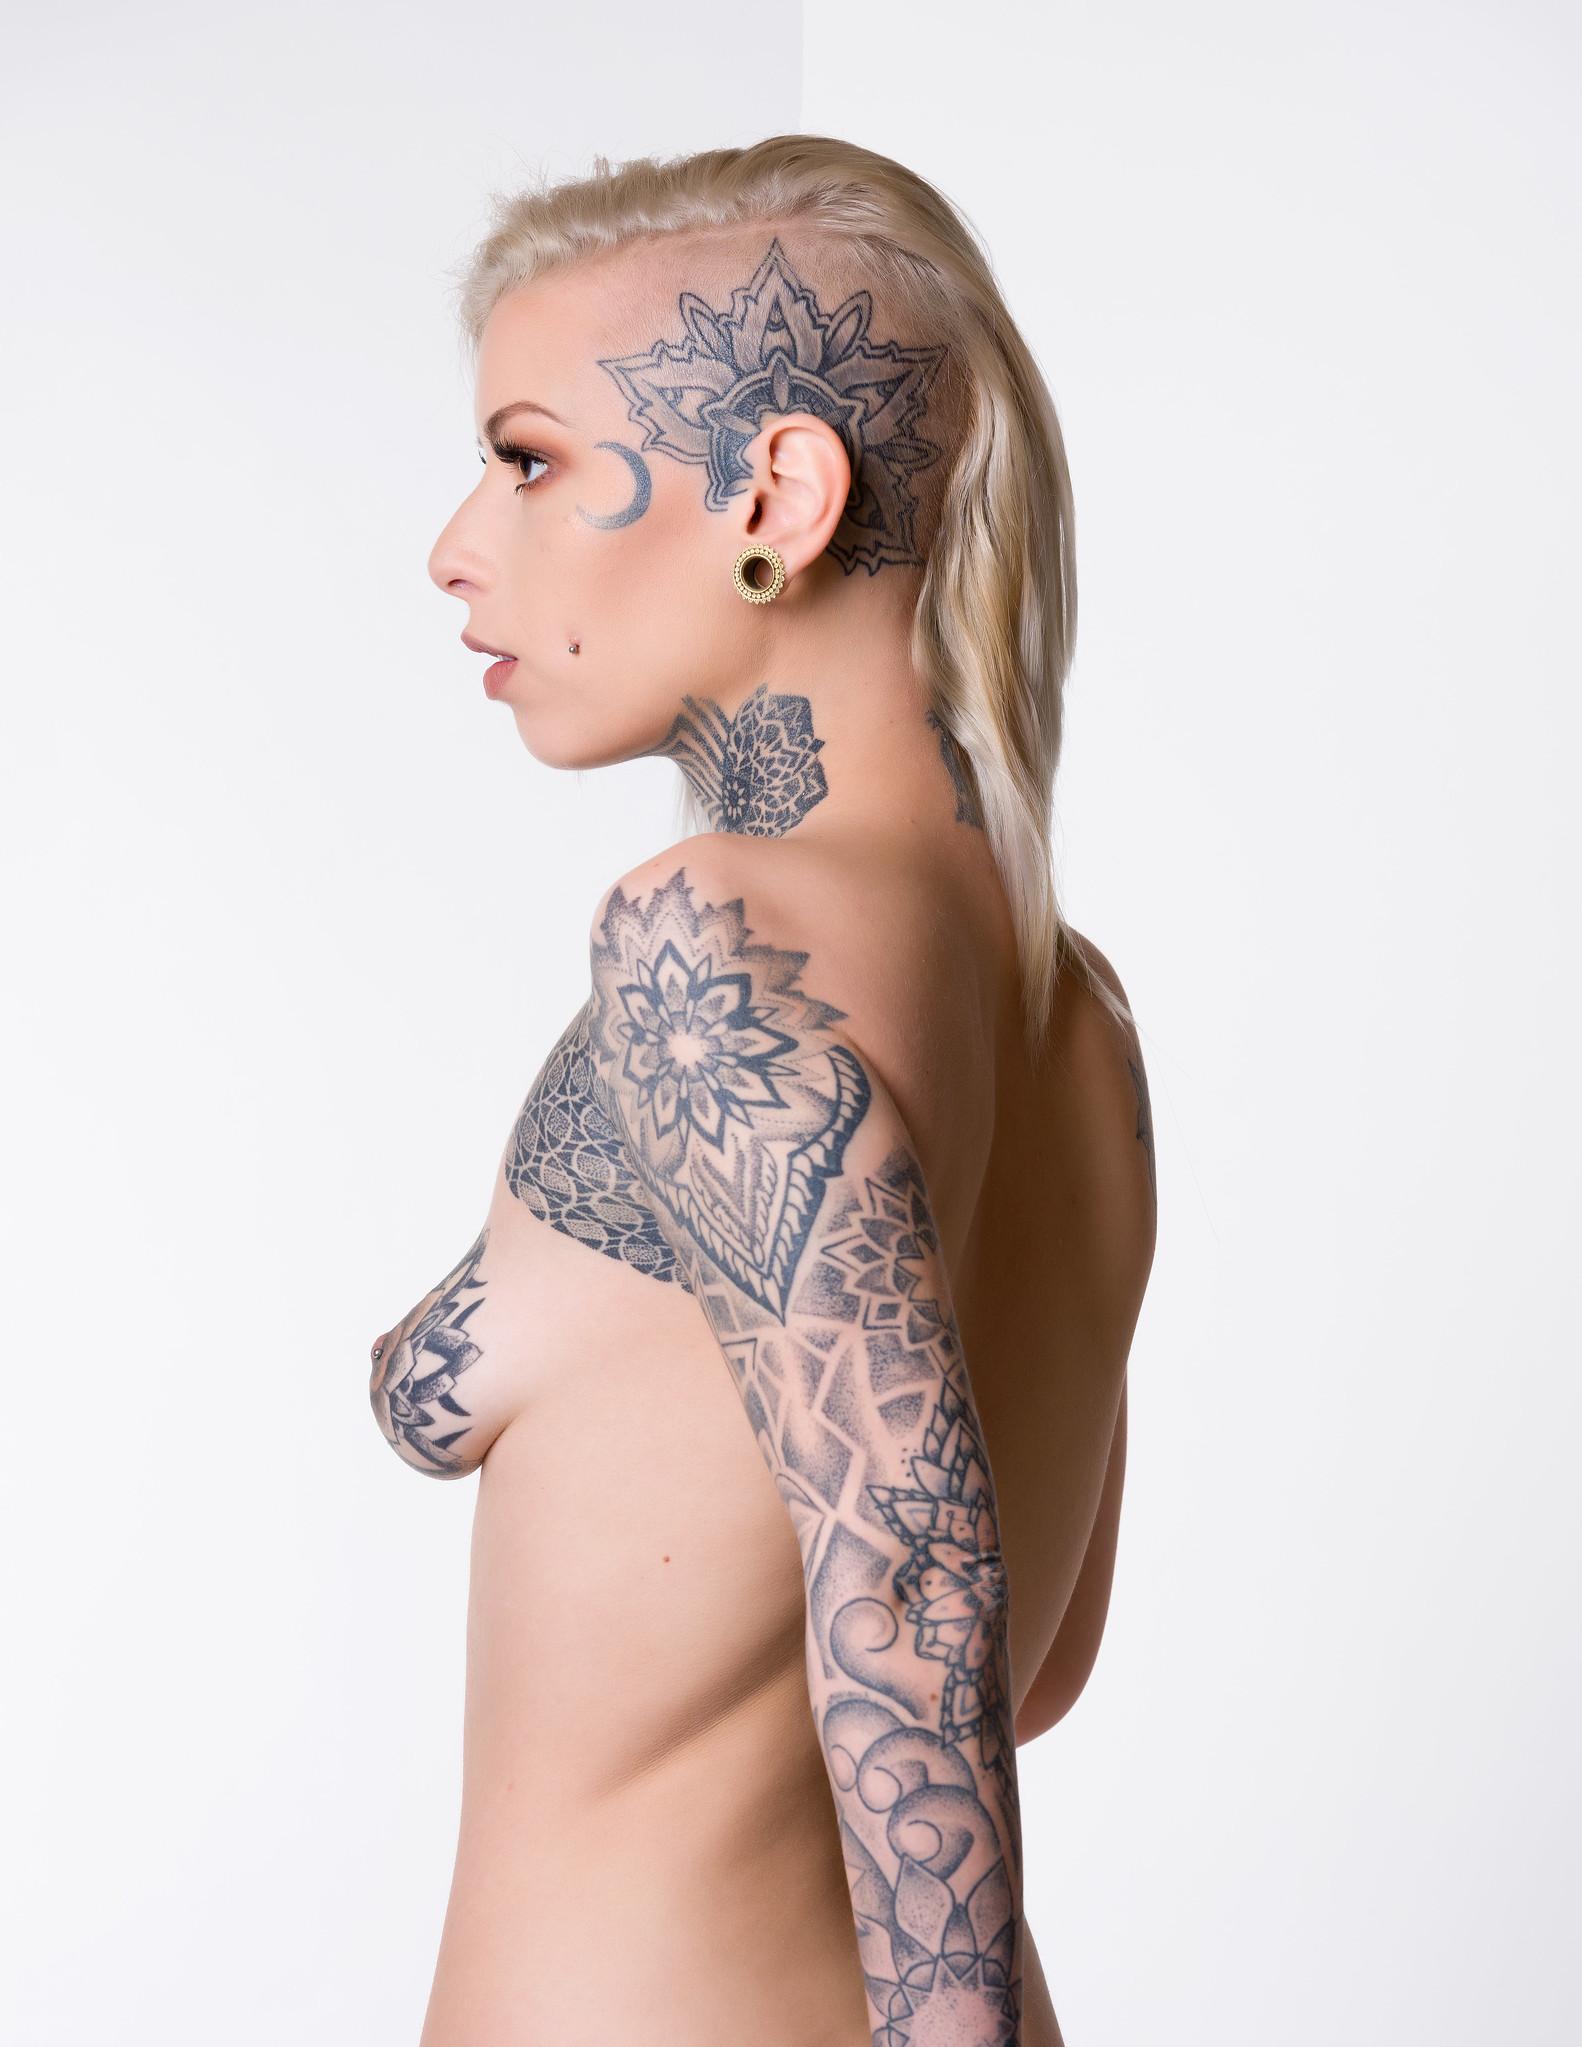 the nude in profile - stephanie katharine